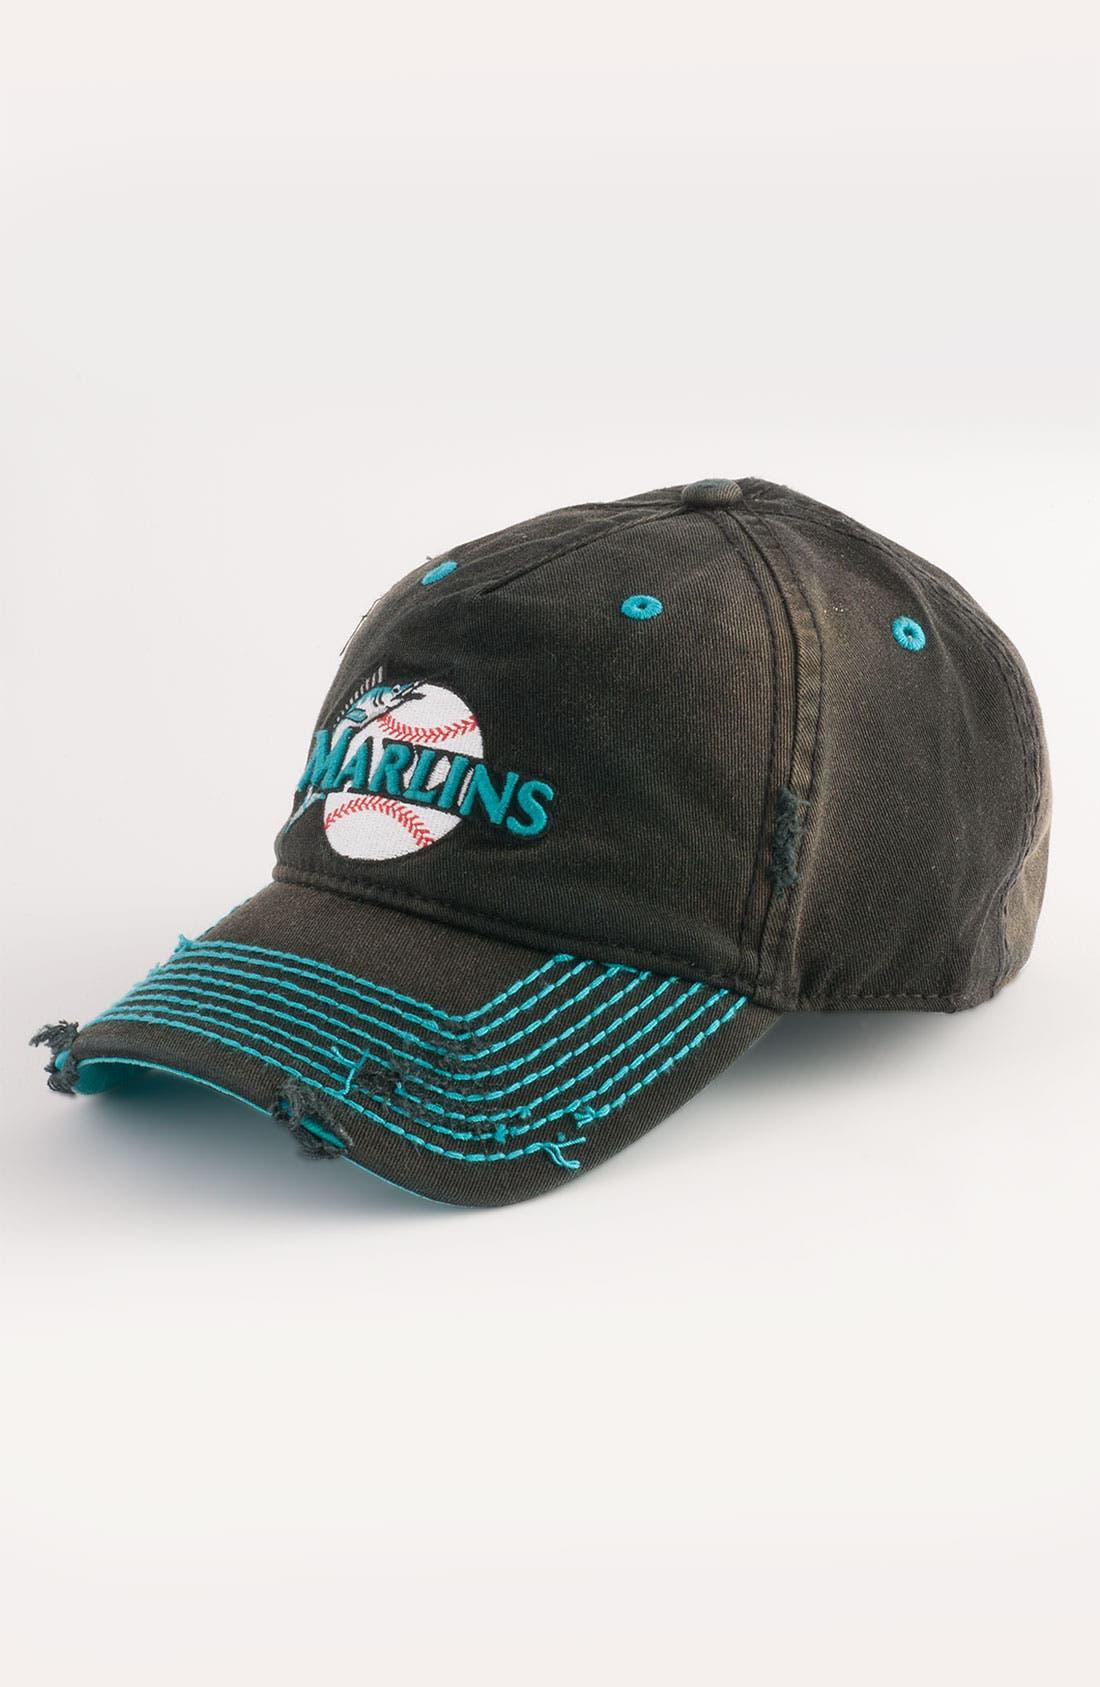 Alternate Image 1 Selected - American Needle 'Marlins' Baseball Cap